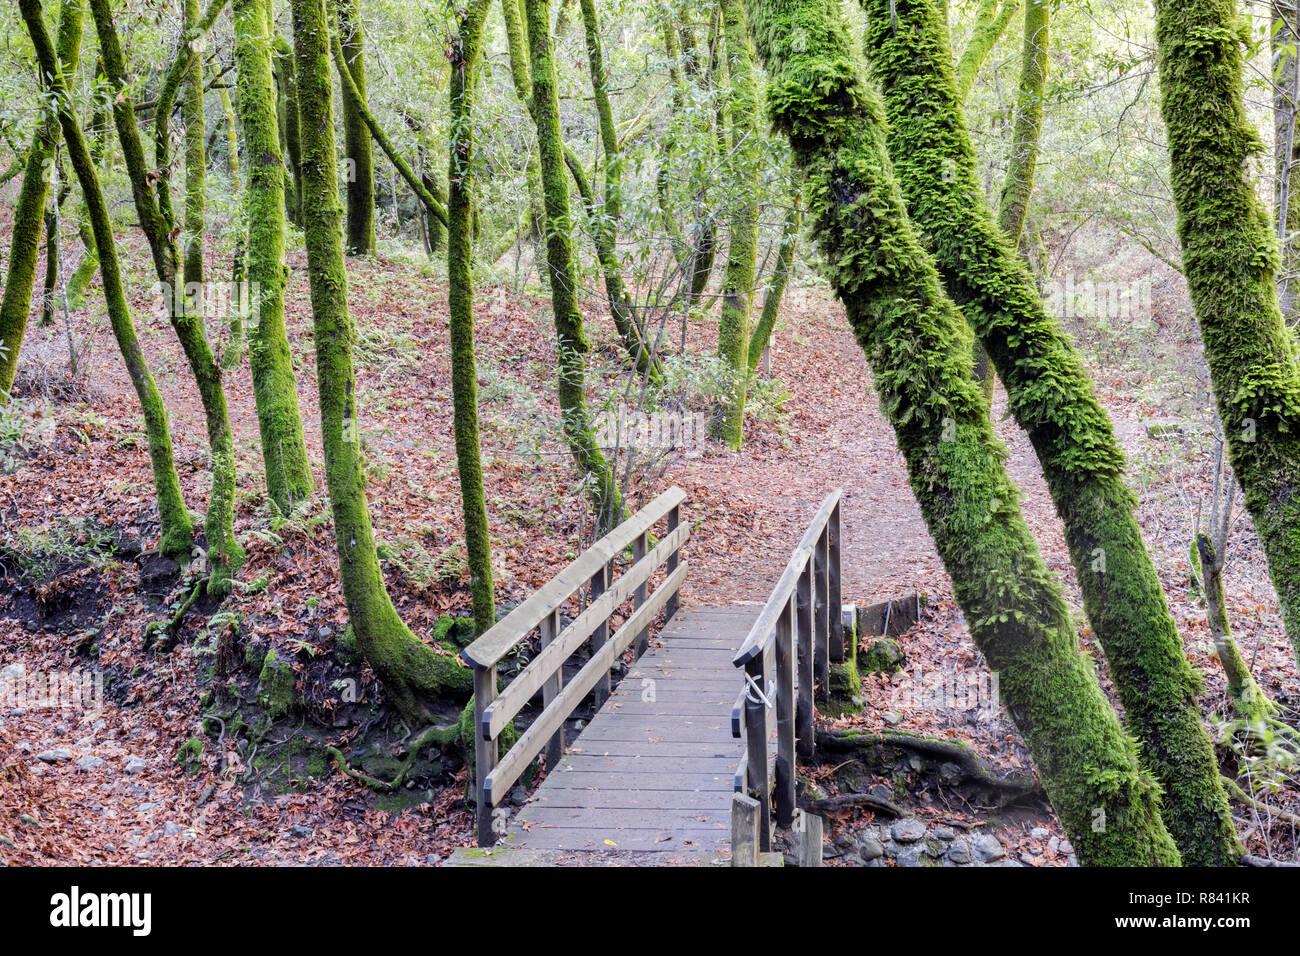 Footbridge in California Bay Laurel Forest. Stock Photo